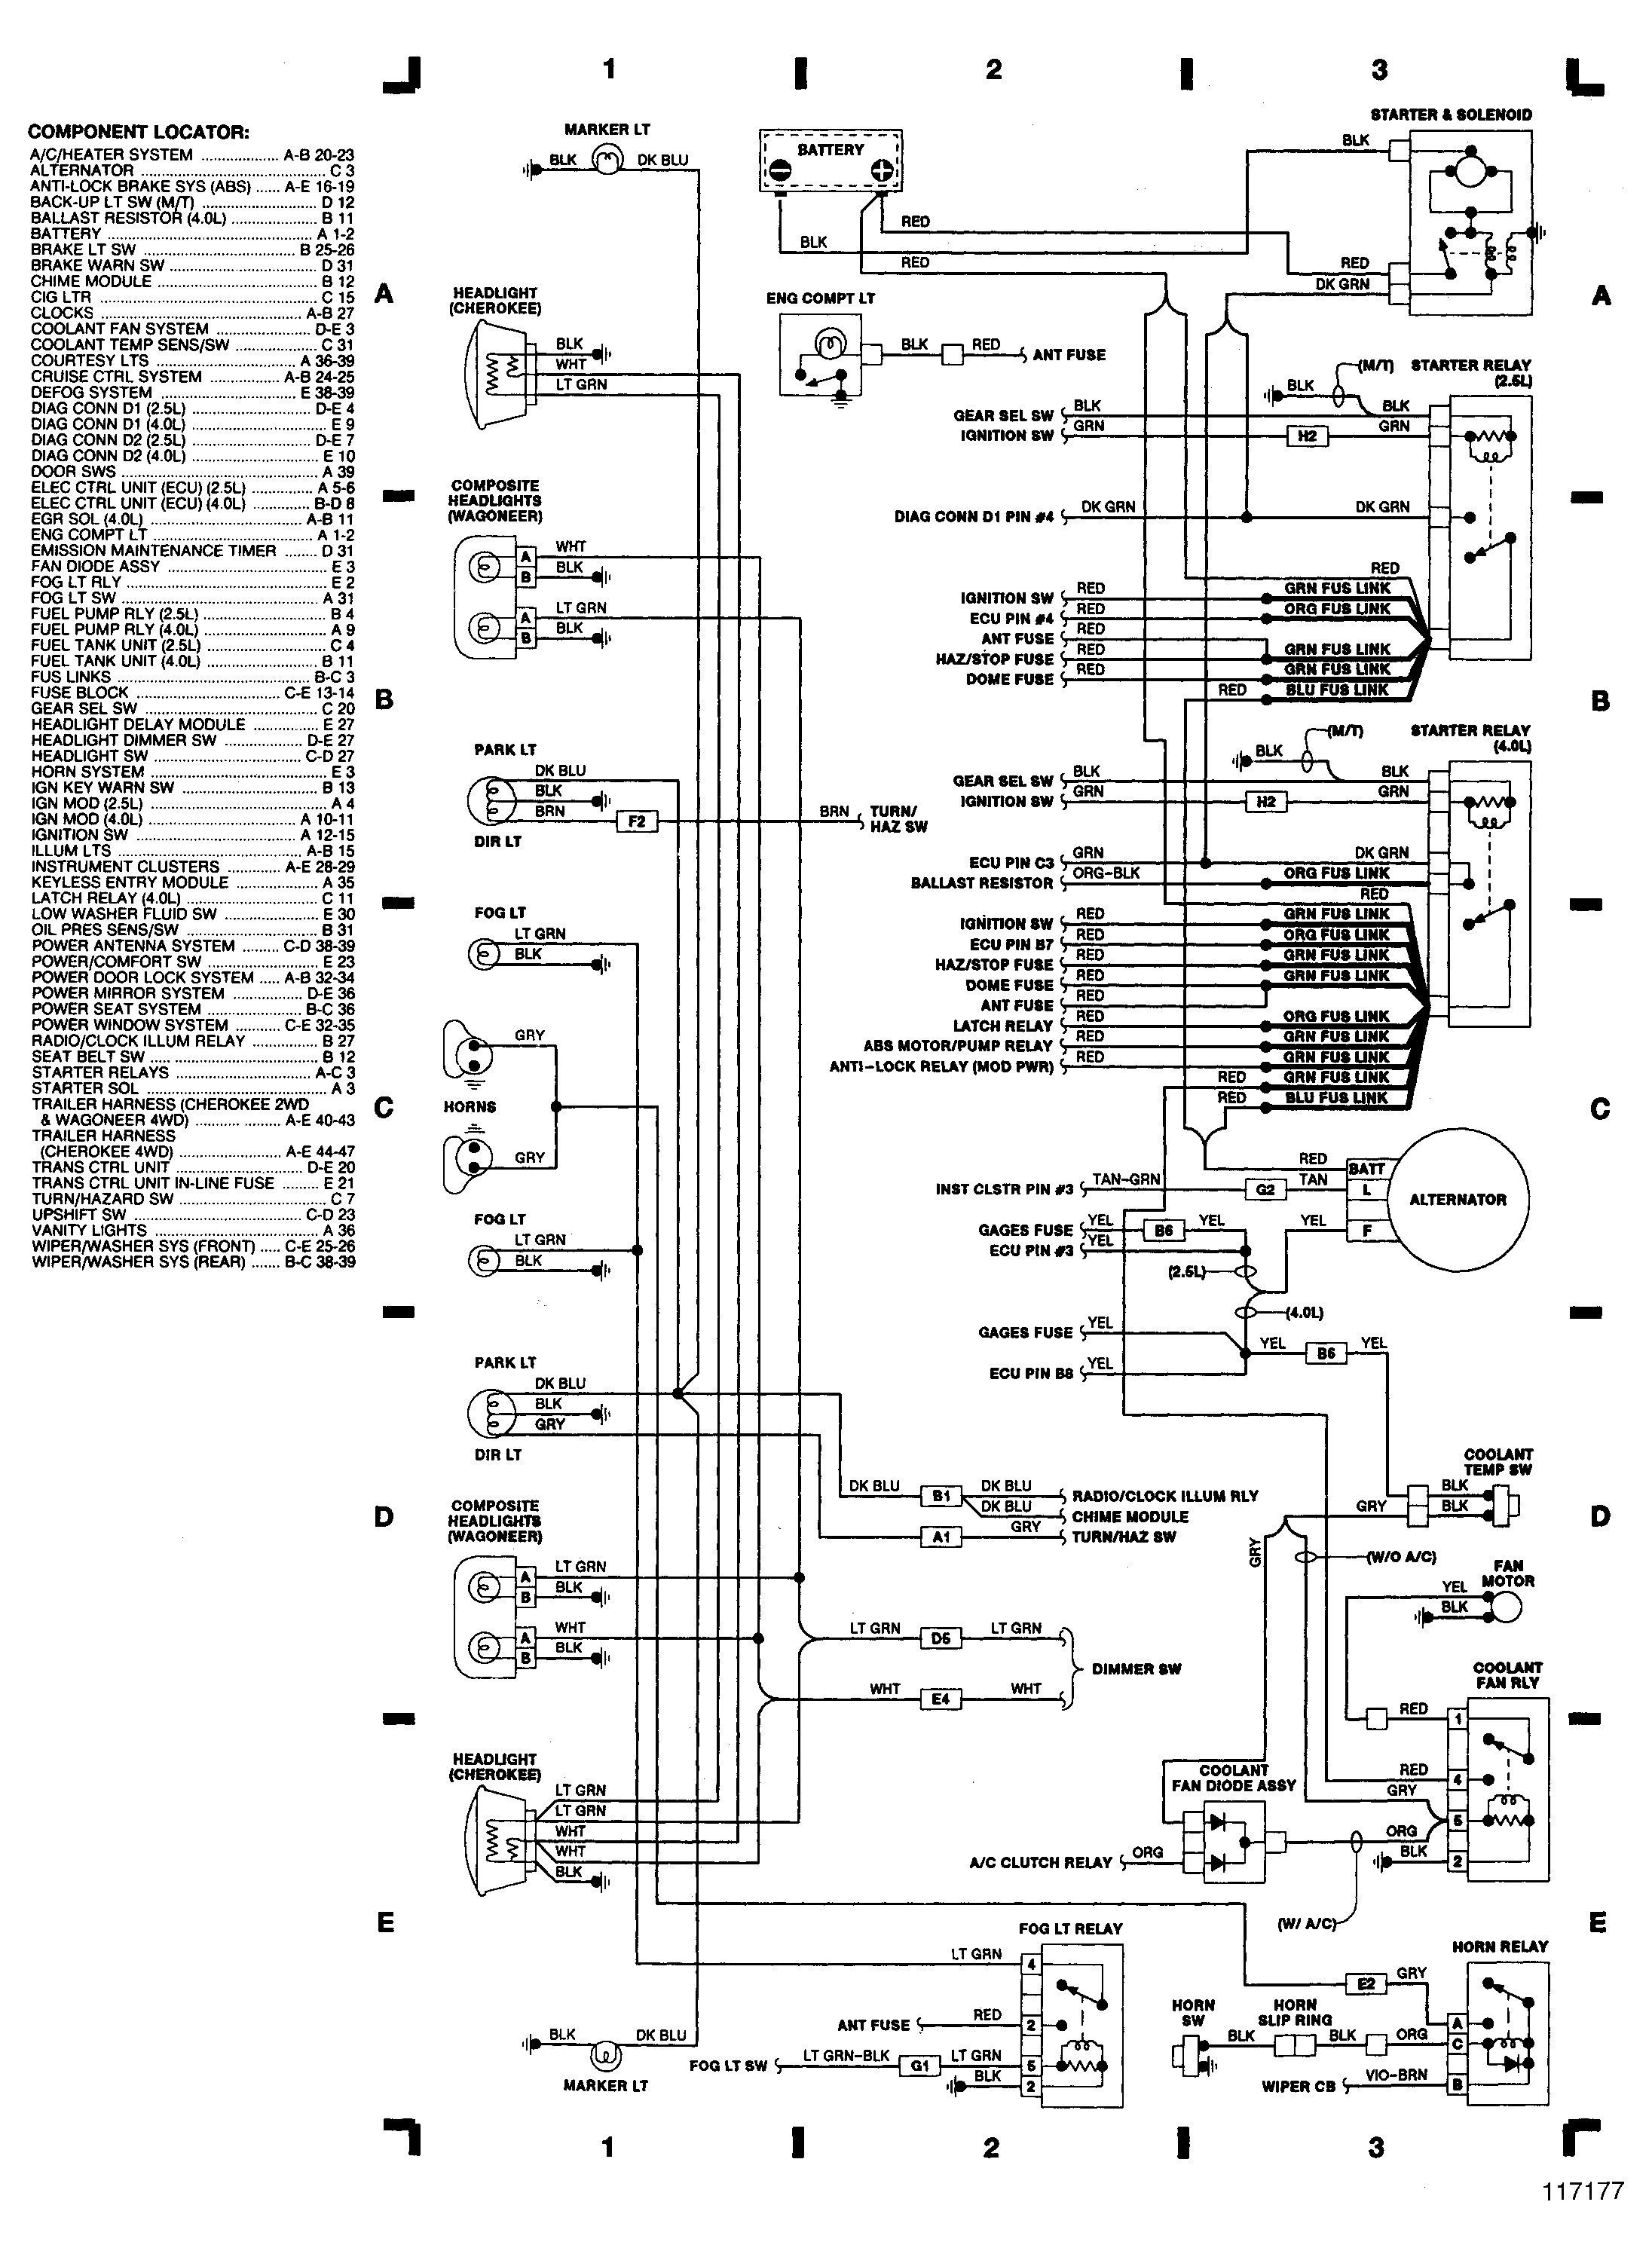 small resolution of fresh wiring diagram yamaha aerox diagrams digramssample fresh wiring diagram yamaha aerox diagrams digramssample diagramimages wiringdiagramsample